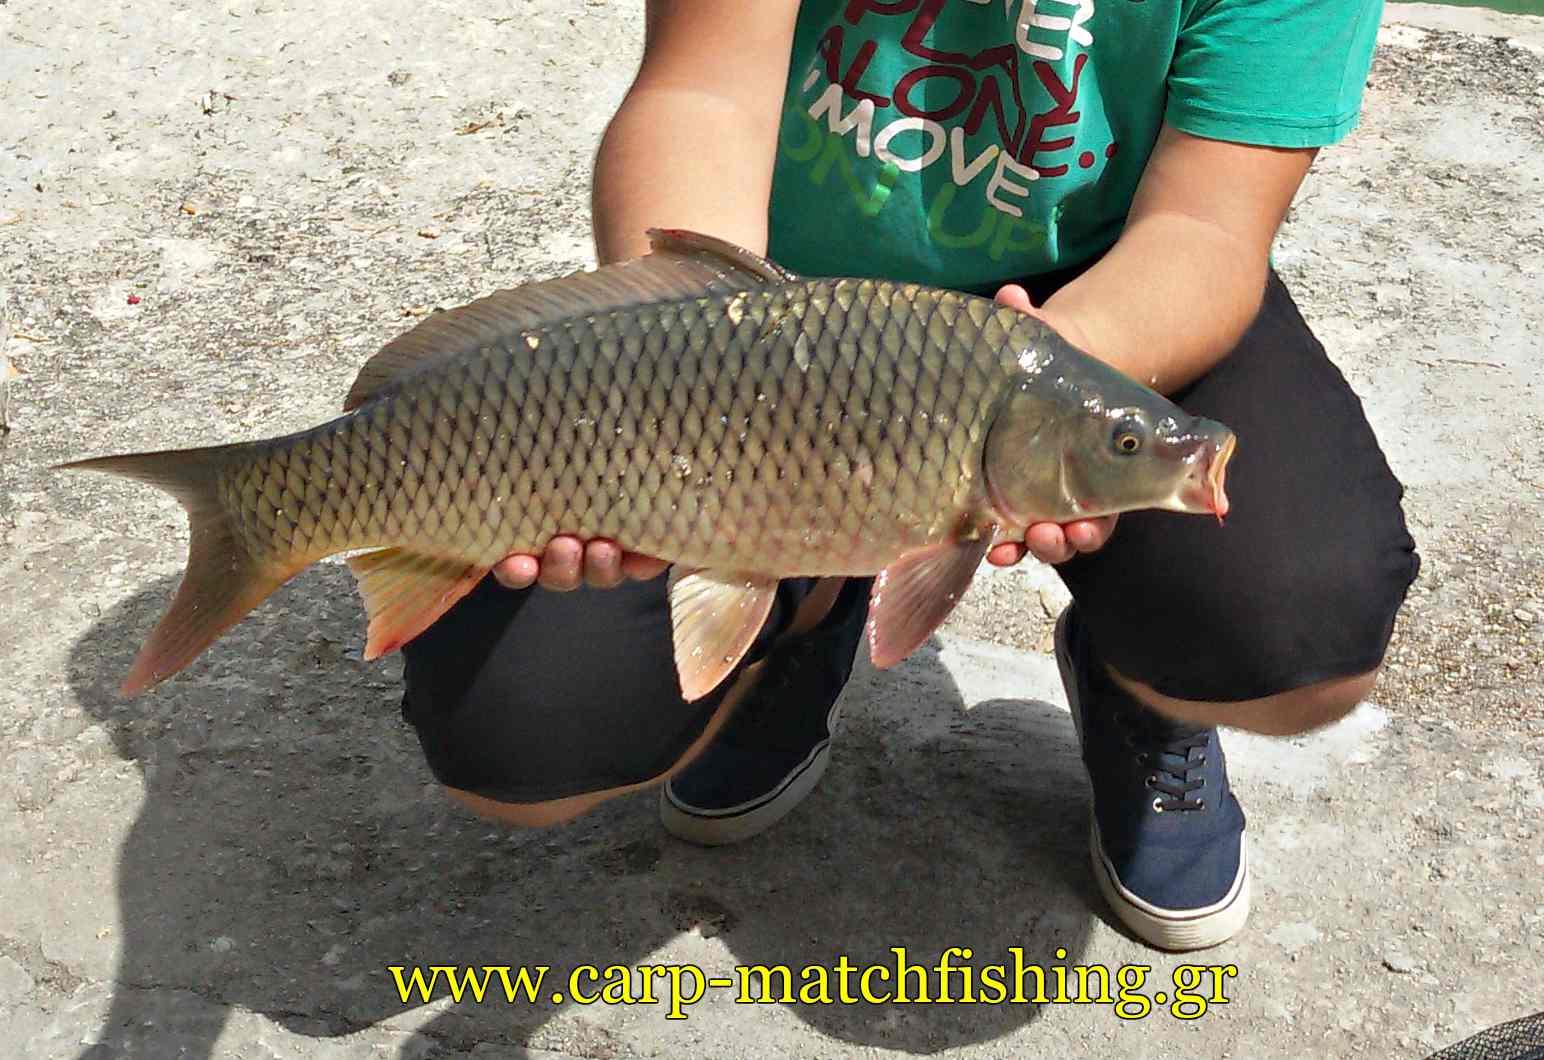 carp-short-sessions-carpmatchfishing